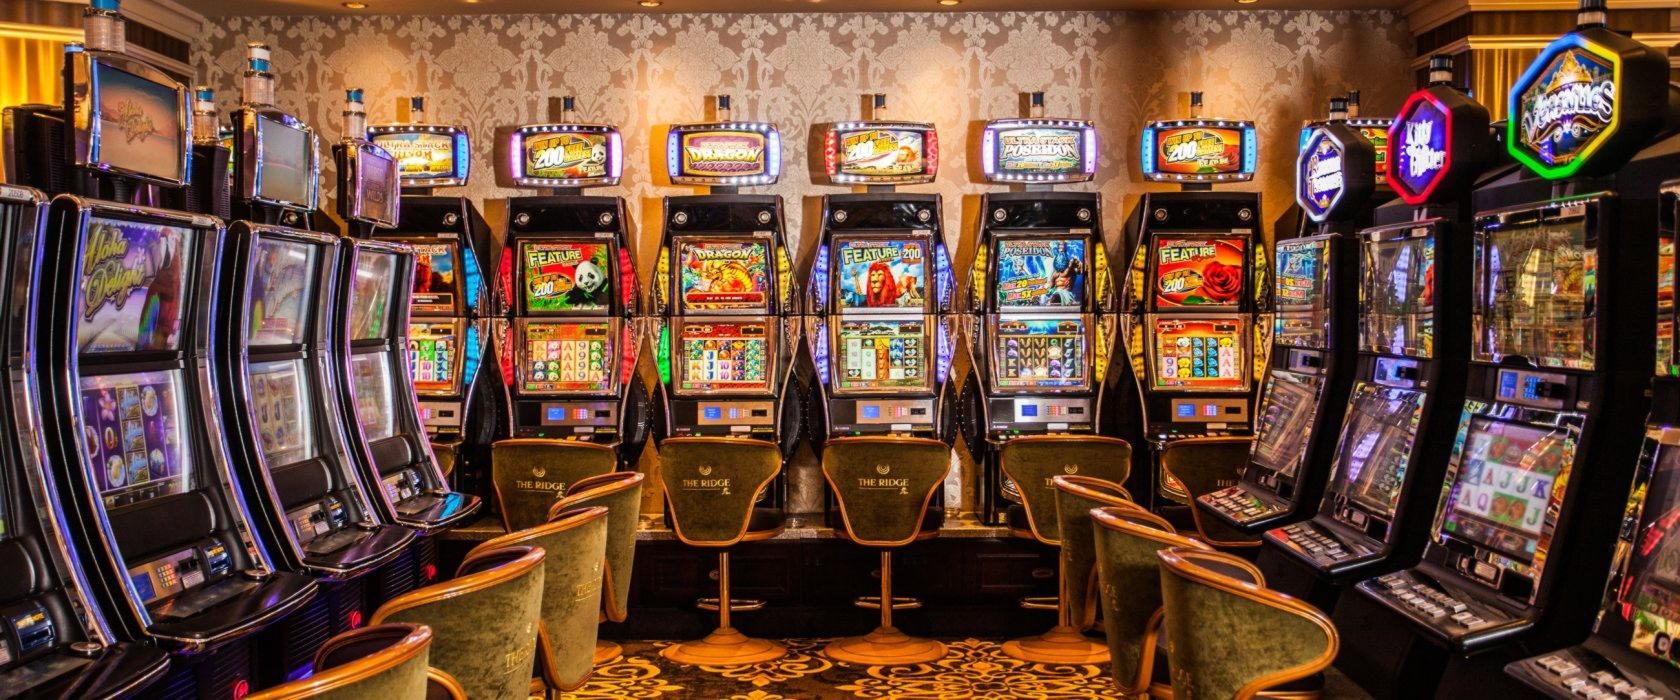 €470 Free Money at Reef Club Casino